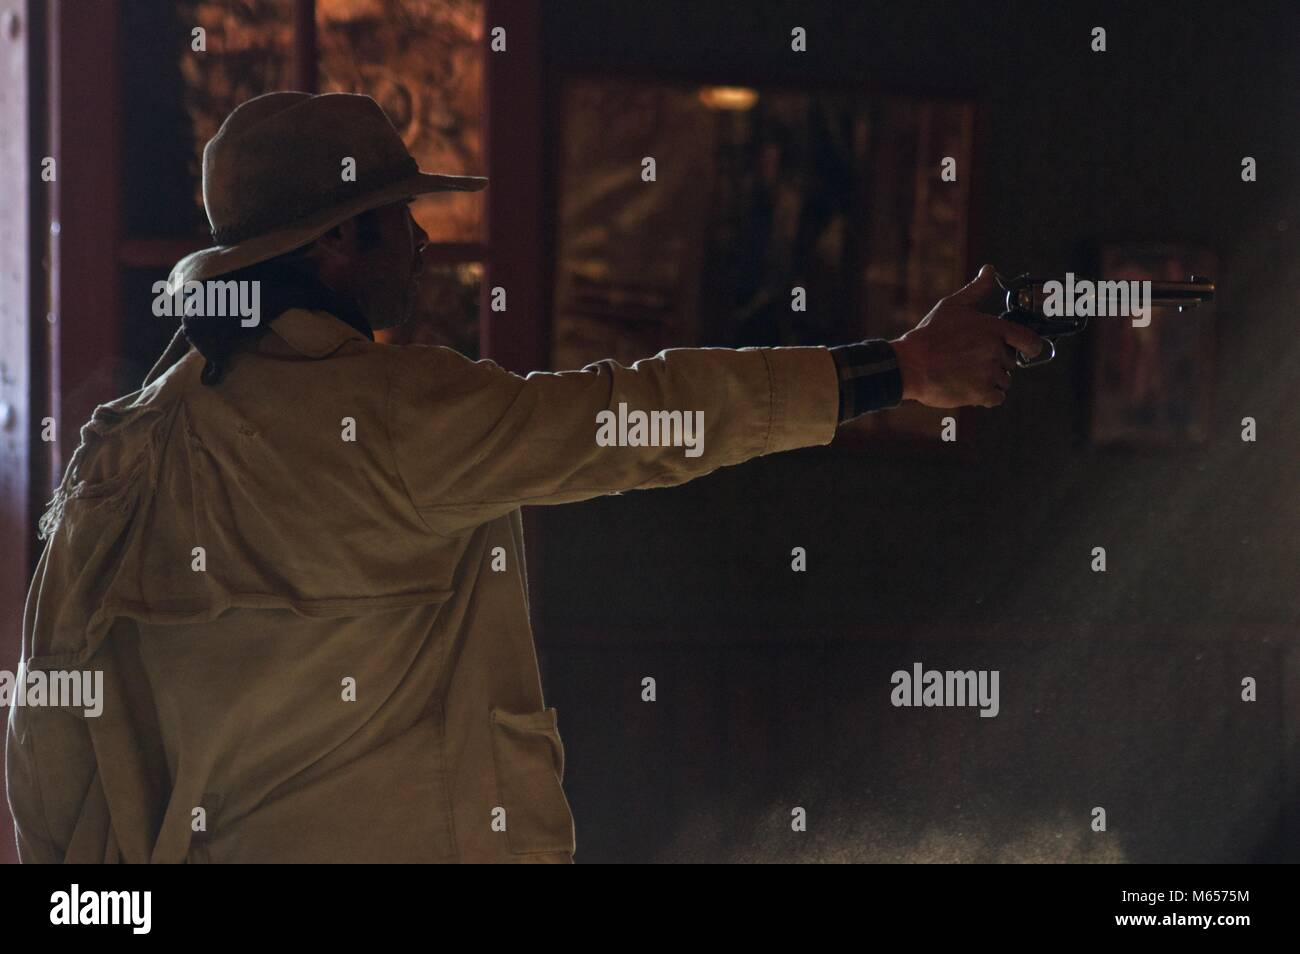 Gun slinging bandit at show at fort Bravo, Texas Hollywood, Tabernas, Spain - Stock Image